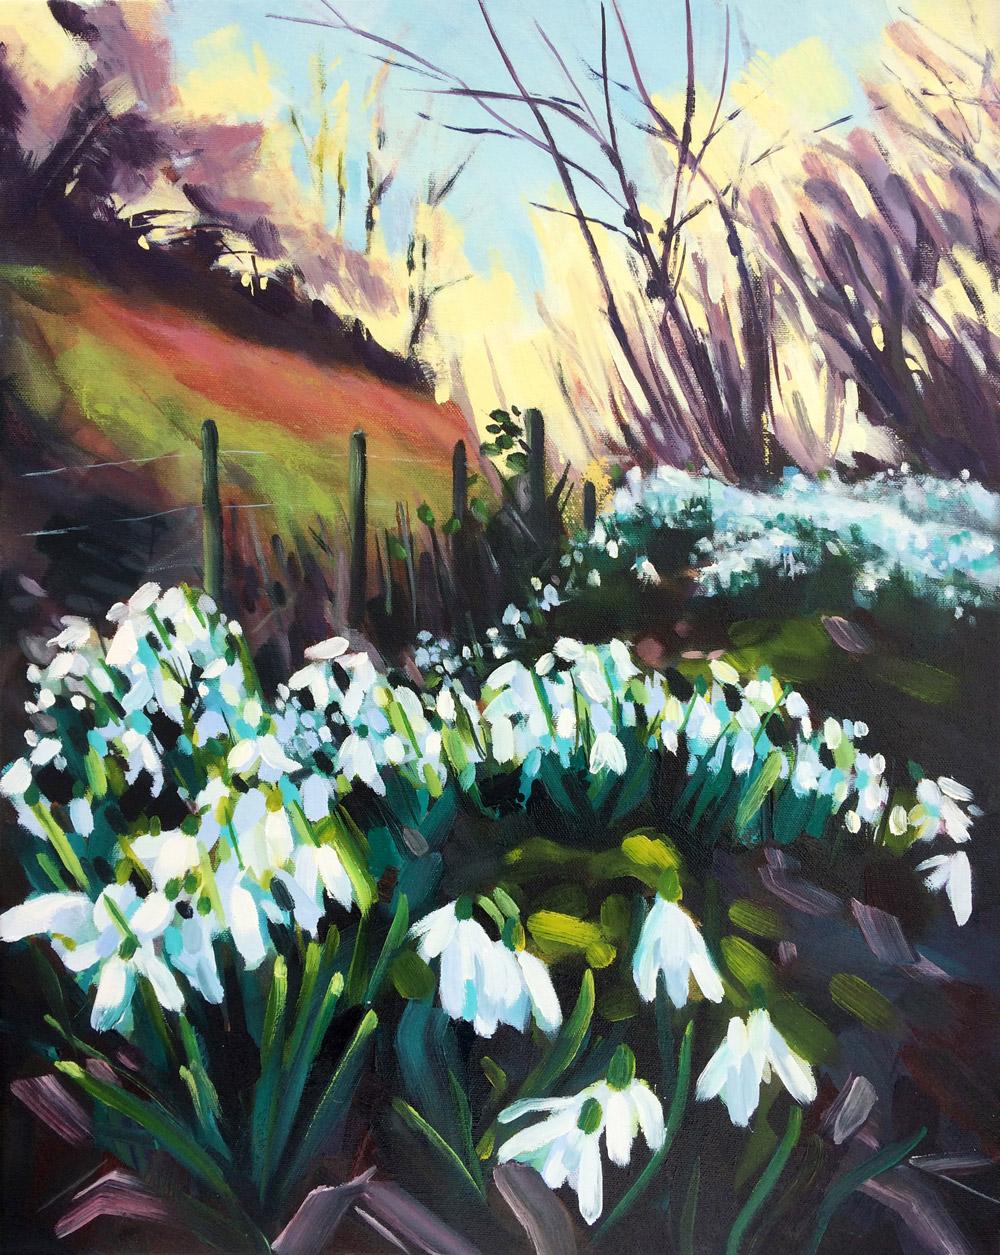 Rachel-Painter-Snowdrops